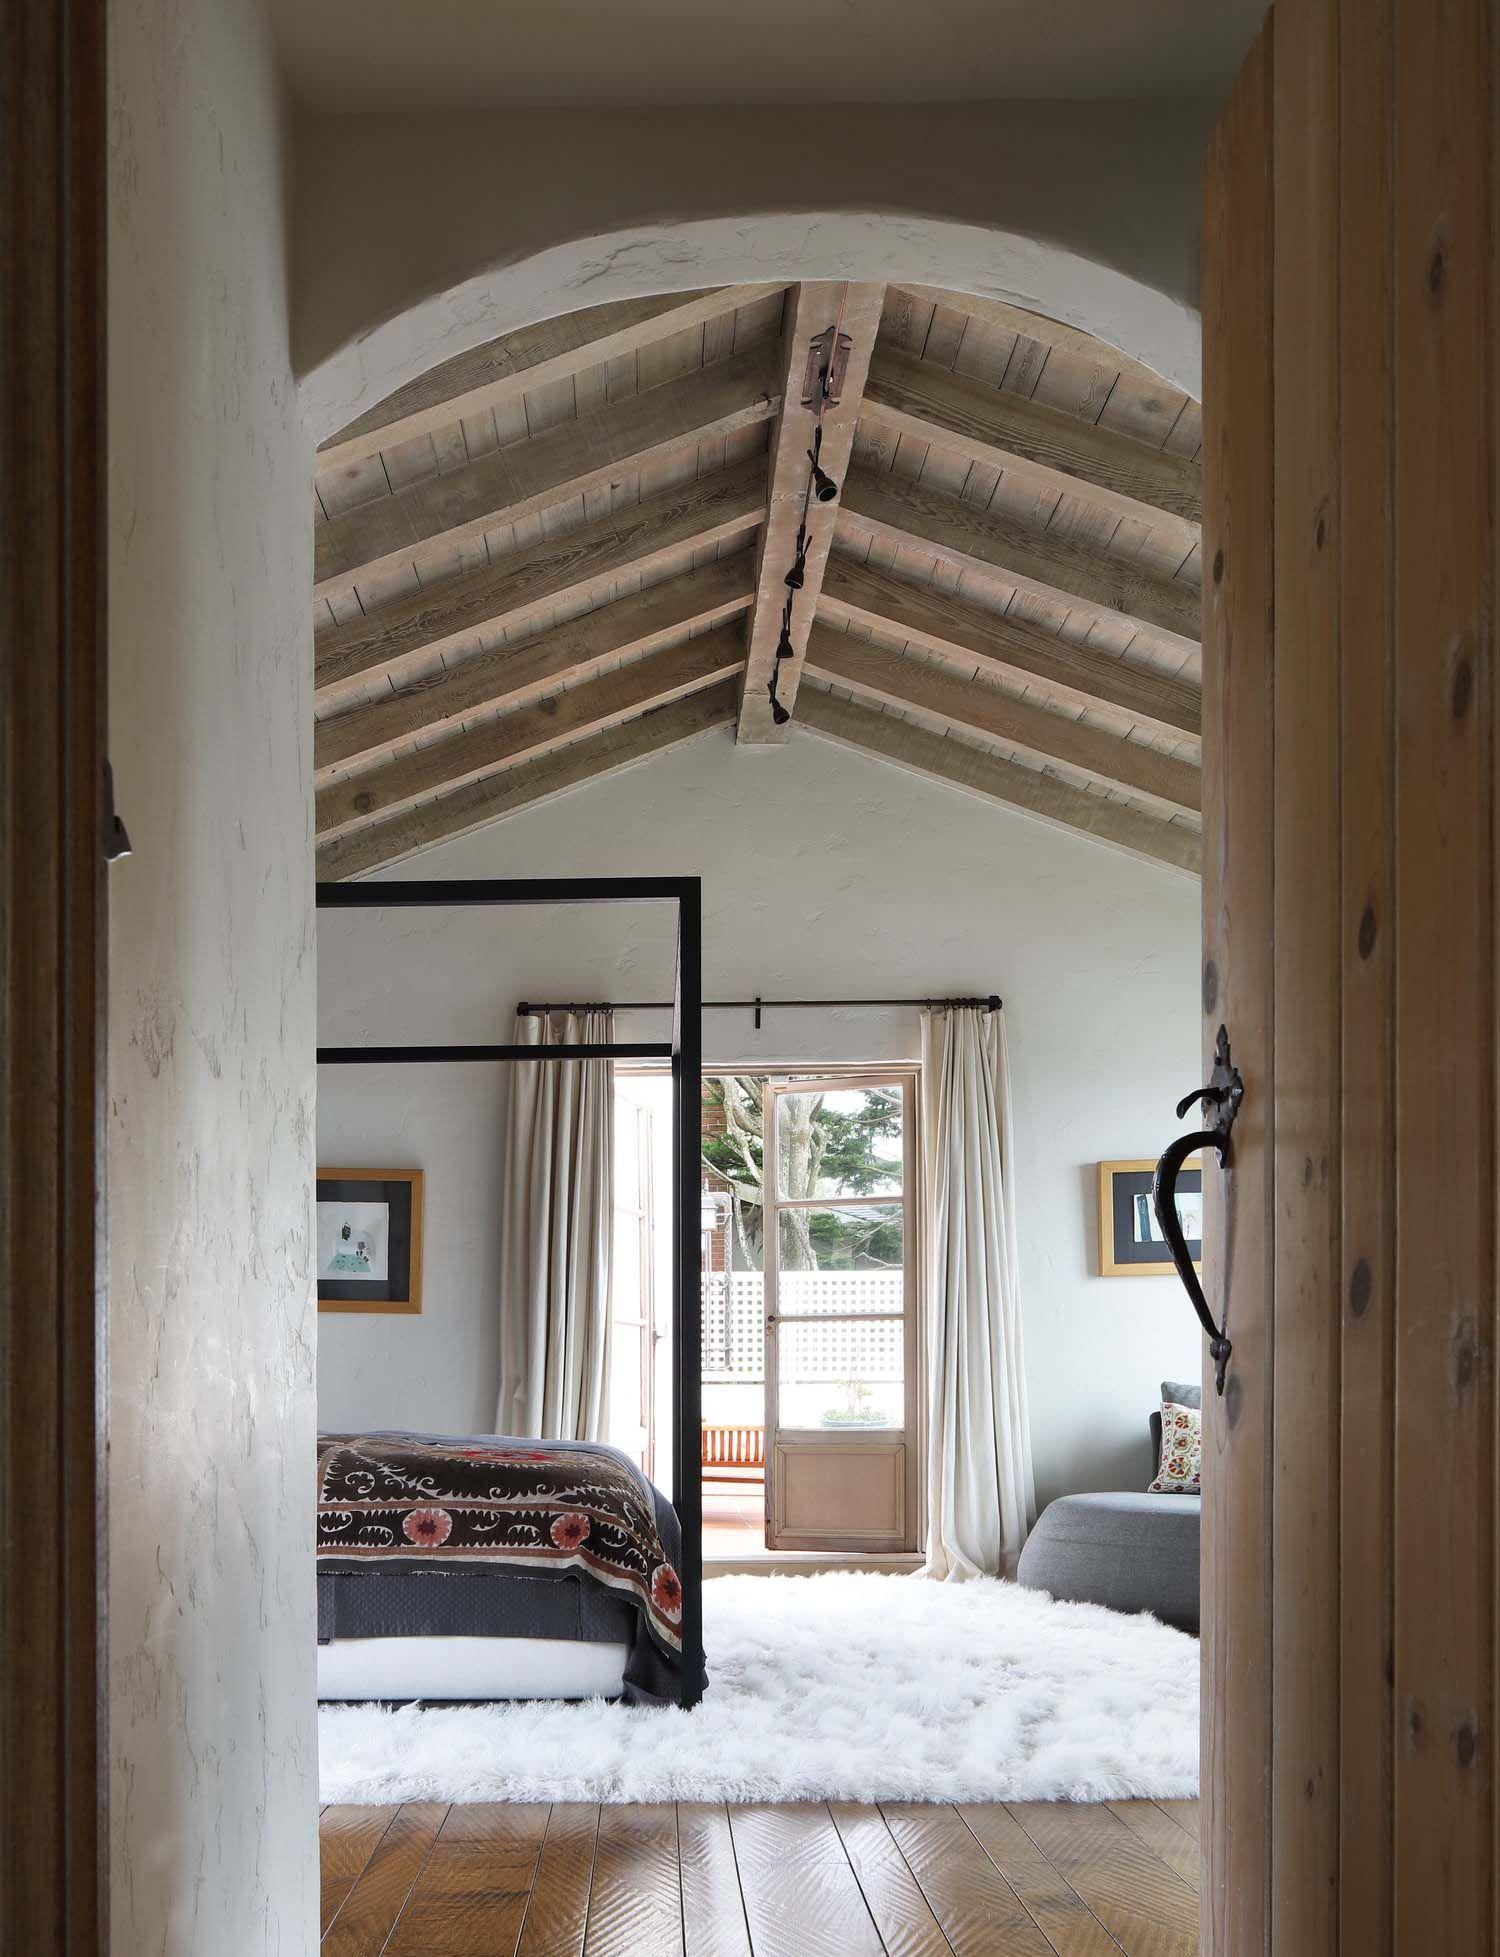 bedroomcolonial bedroom decor. Colonial Bedroom Ideas. Gorgeous Spanish Style Renovation In San Francisco. Décorbedroom Ideas Bedroomcolonial Decor M